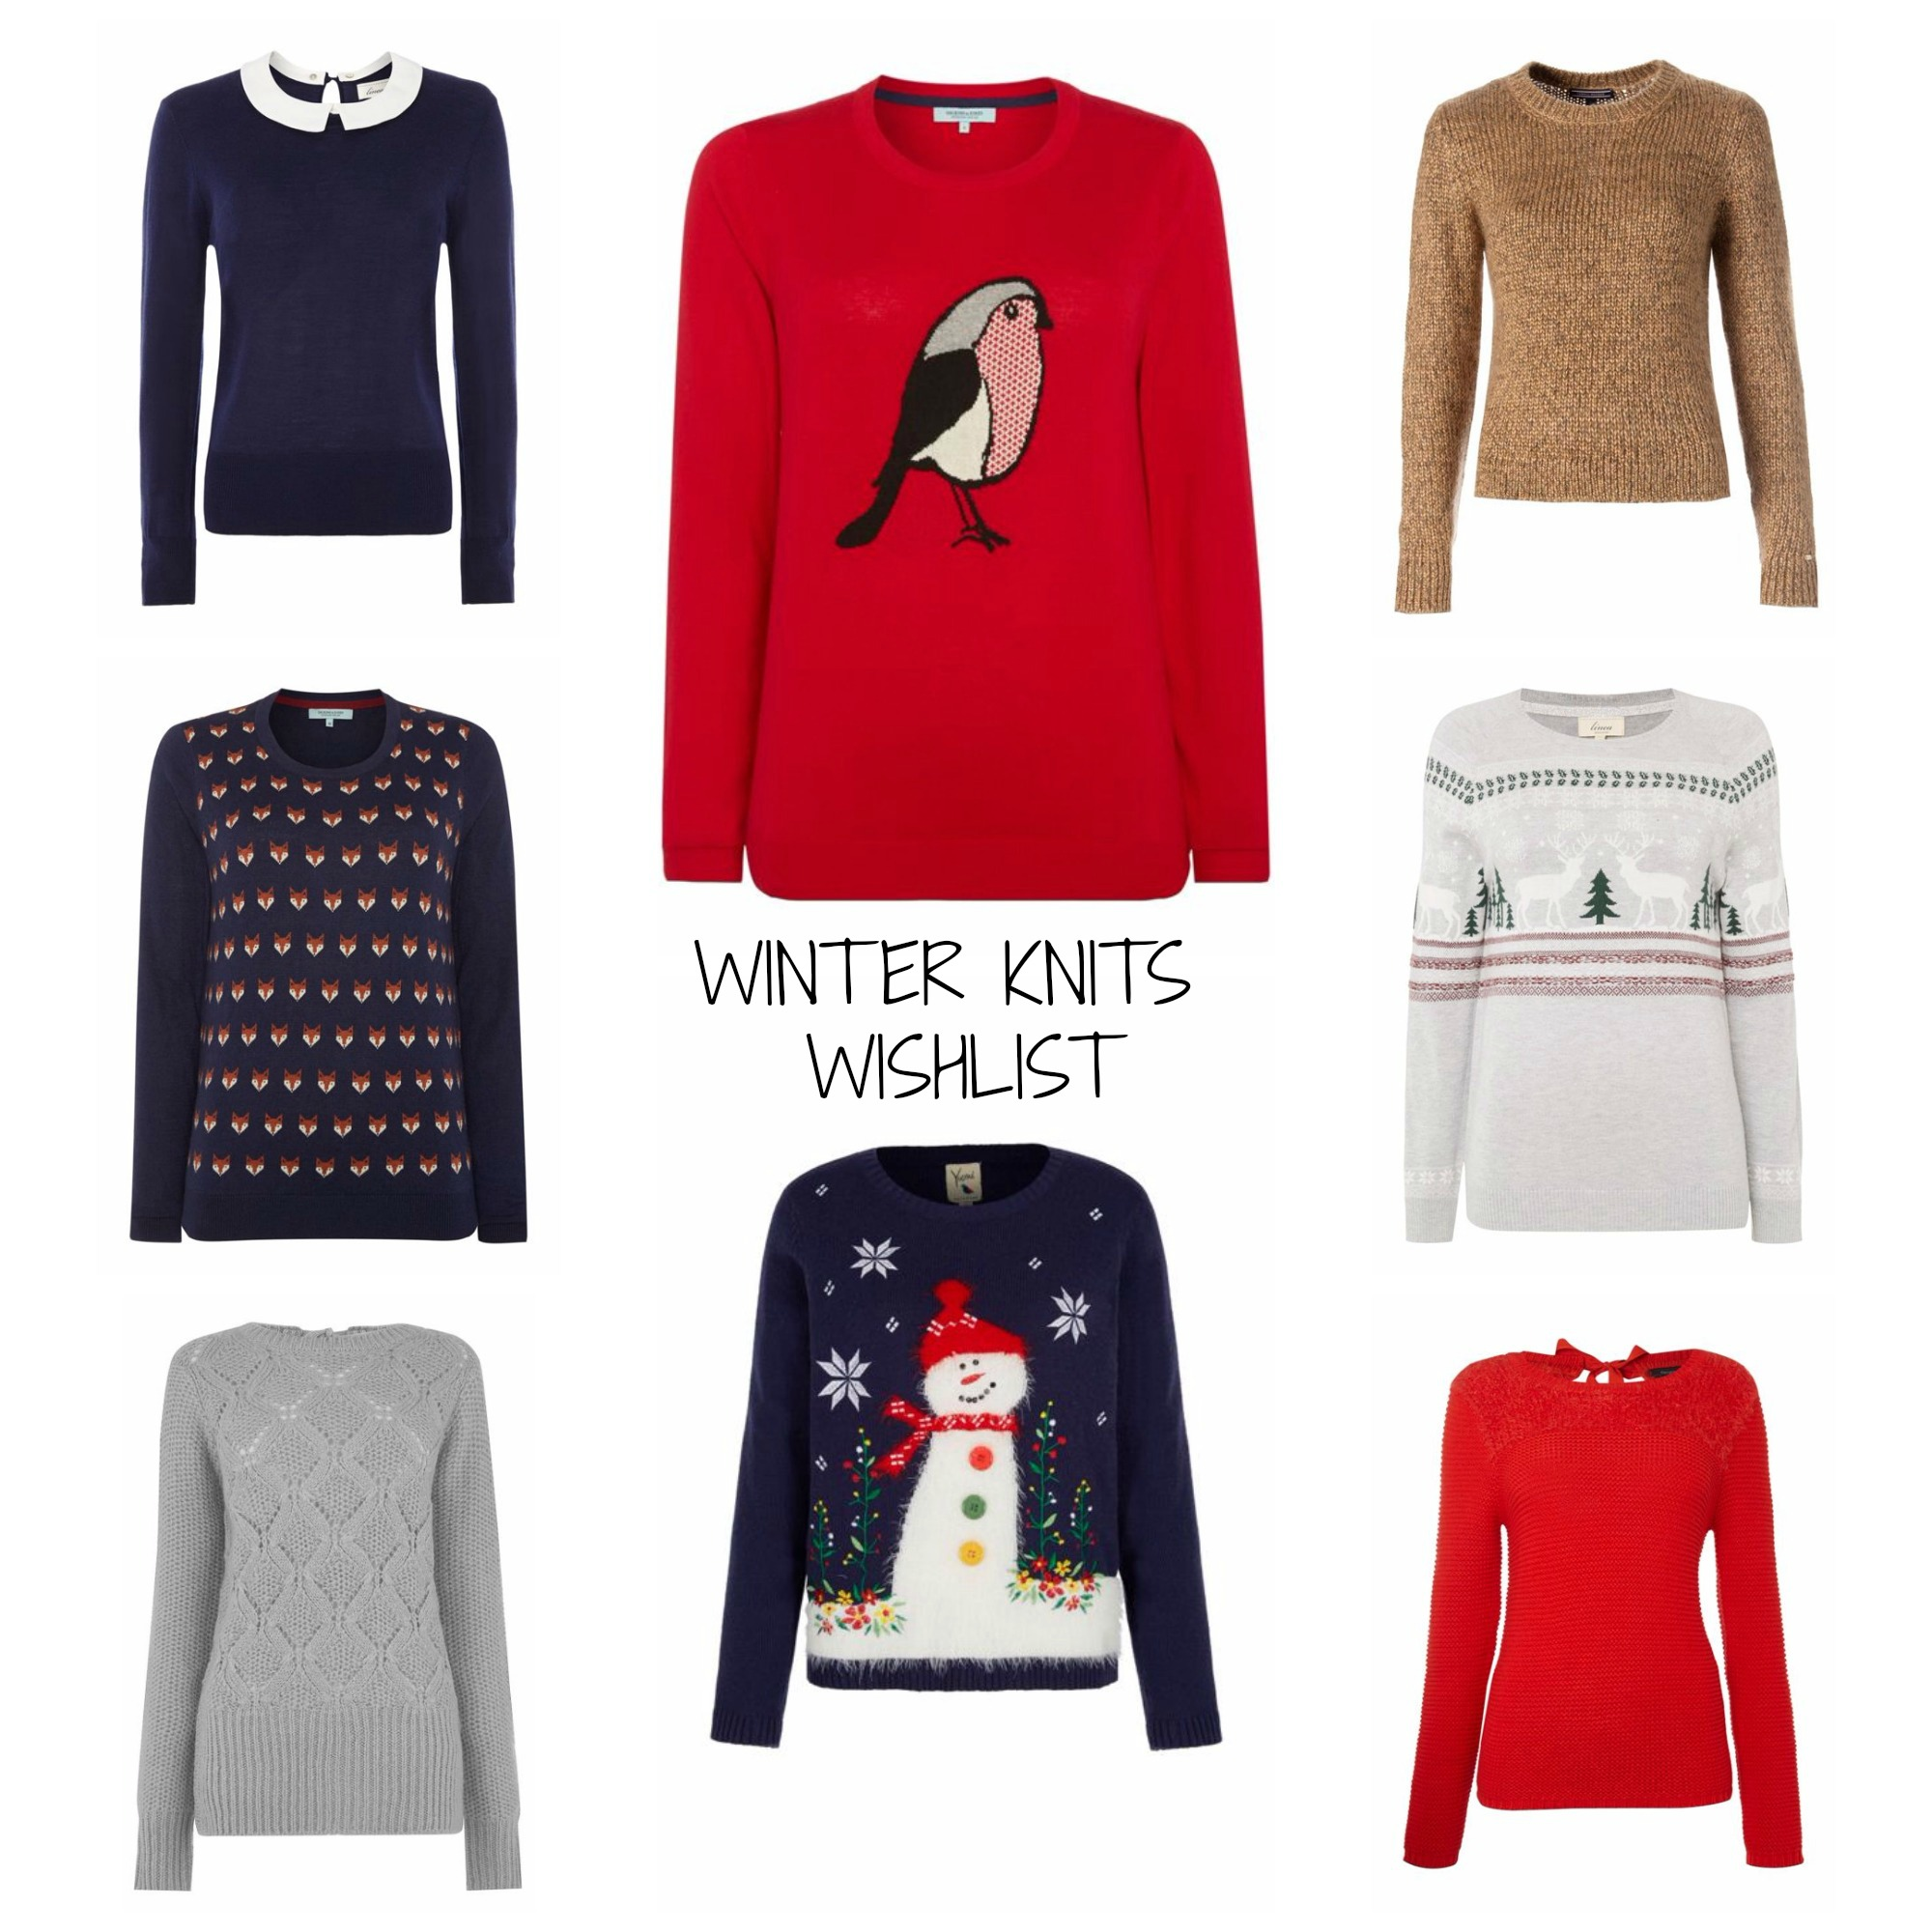 winter knits wishlist